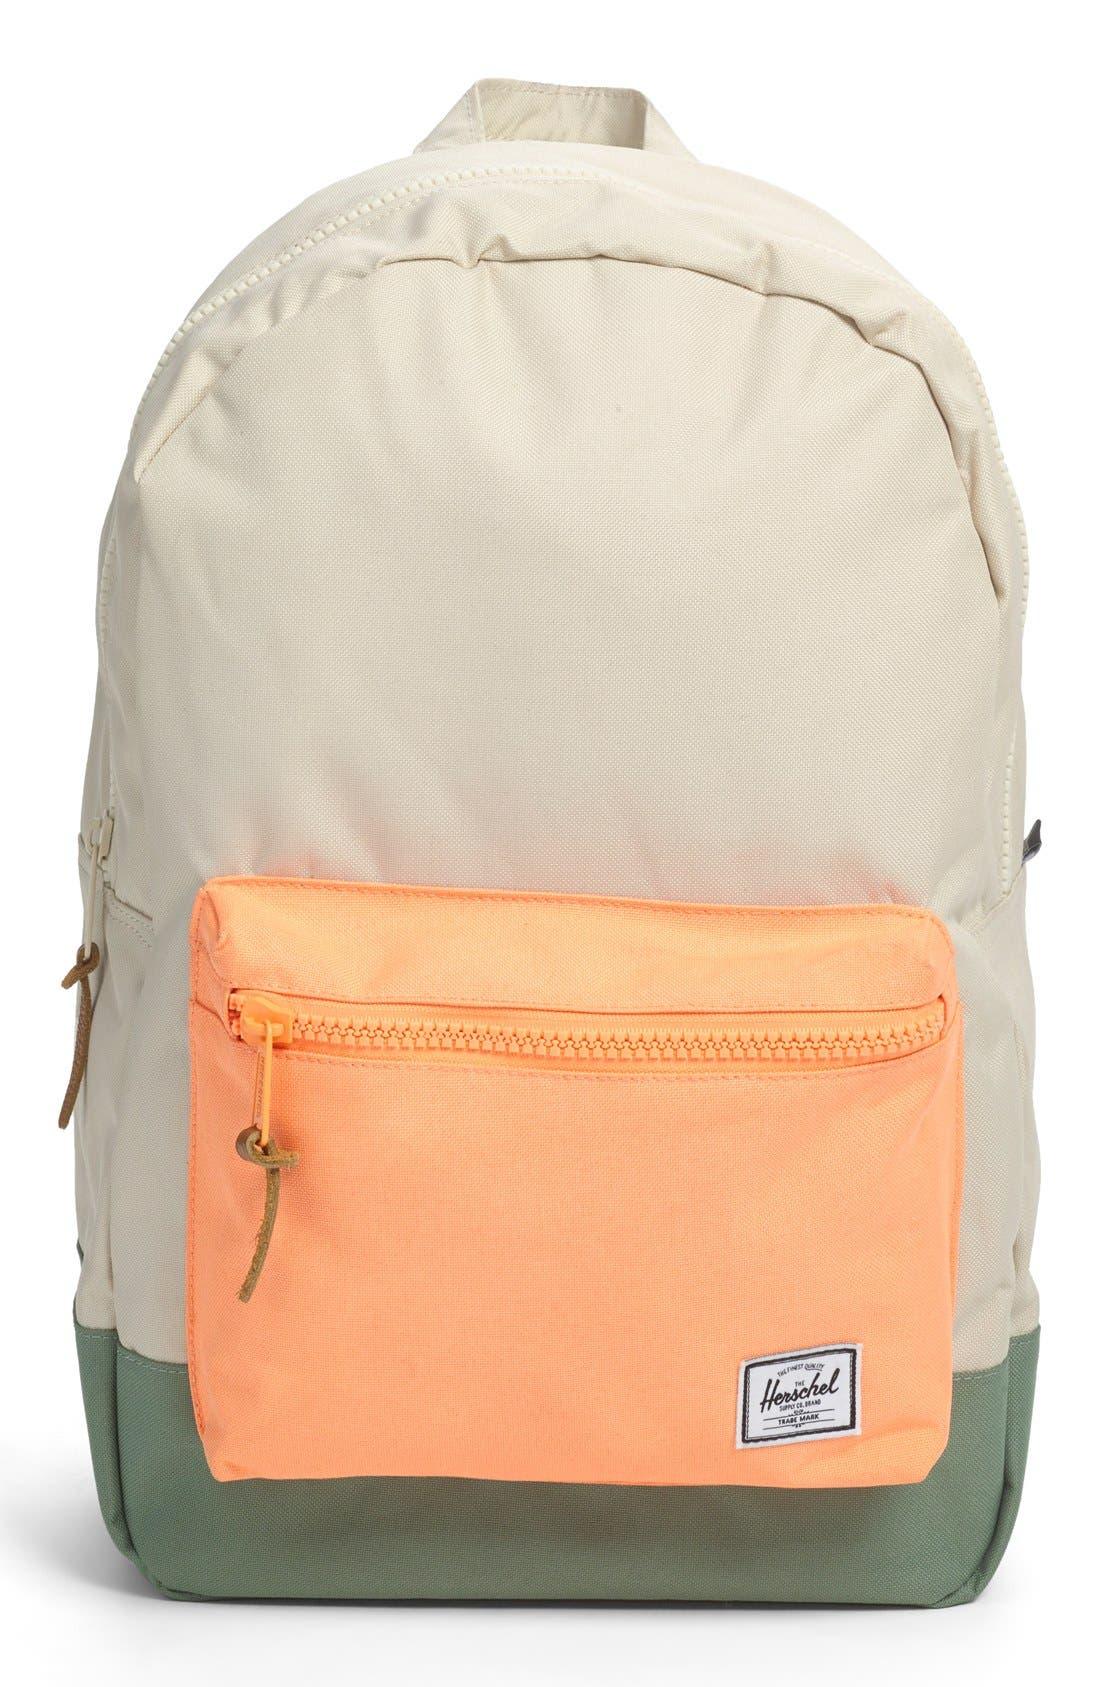 Alternate Image 1 Selected - Herschel Supply Co. 'Settlement Mid Volume' Backpack